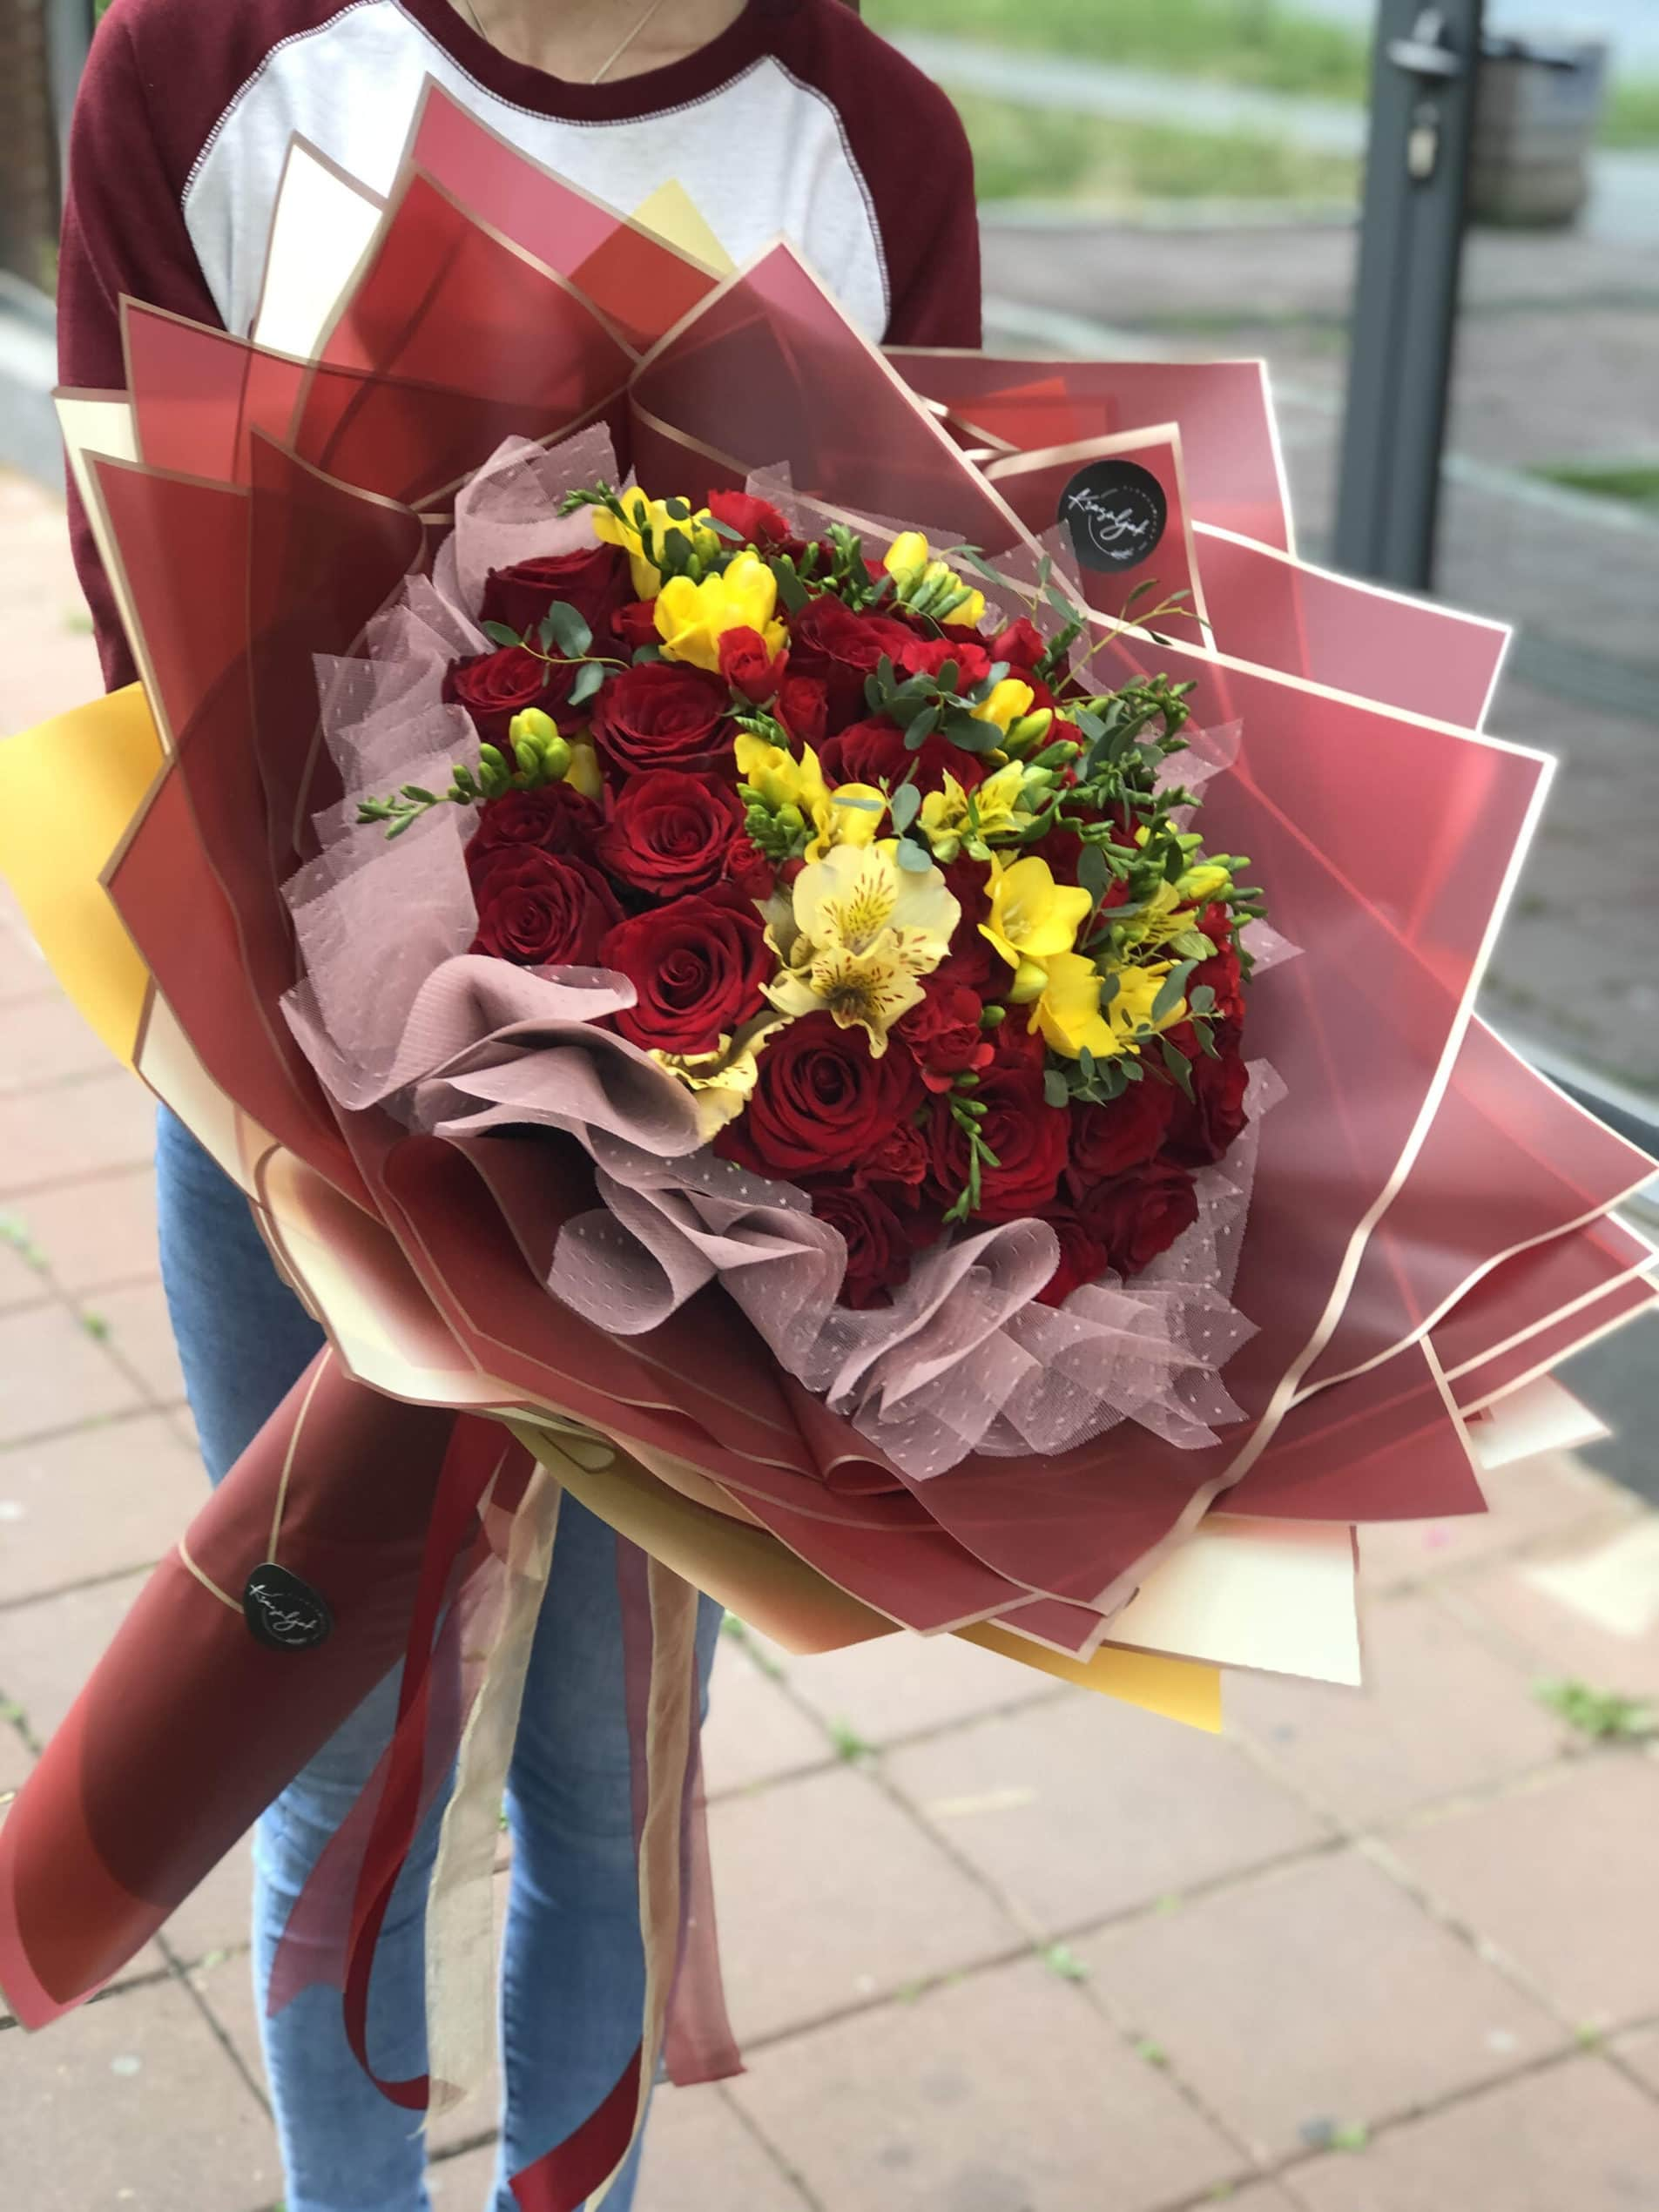 Cveće - buket cveća, cvećara